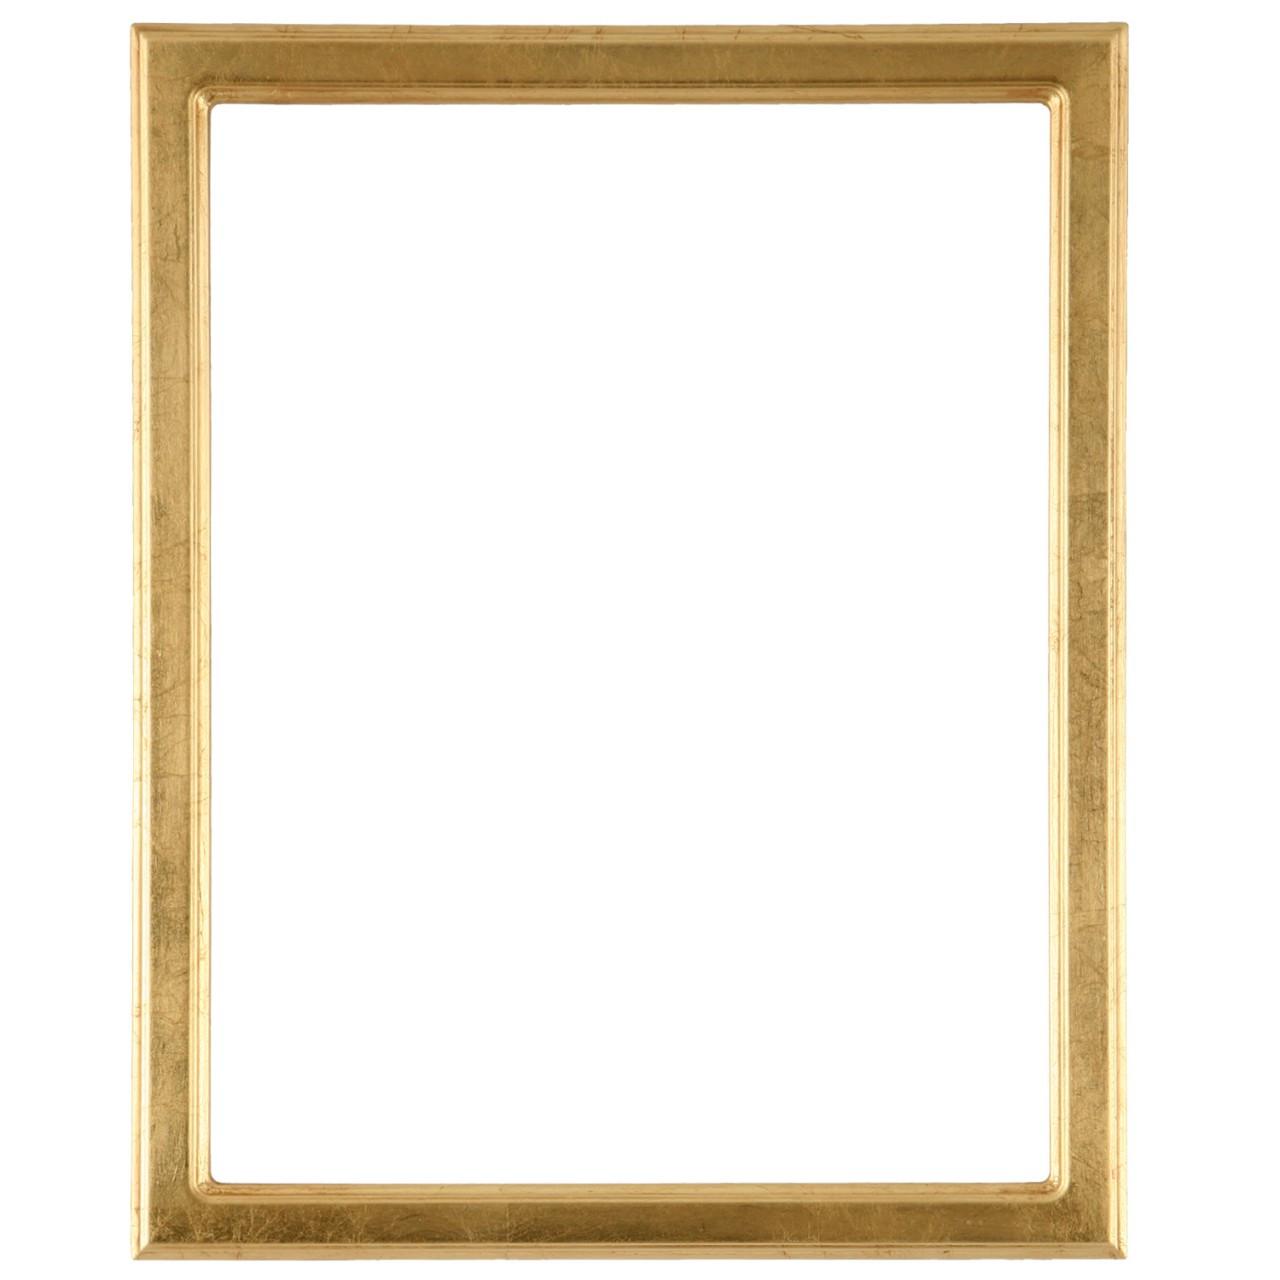 Rectangle Frame In Gold Leaf Finish Simple Antique Gold